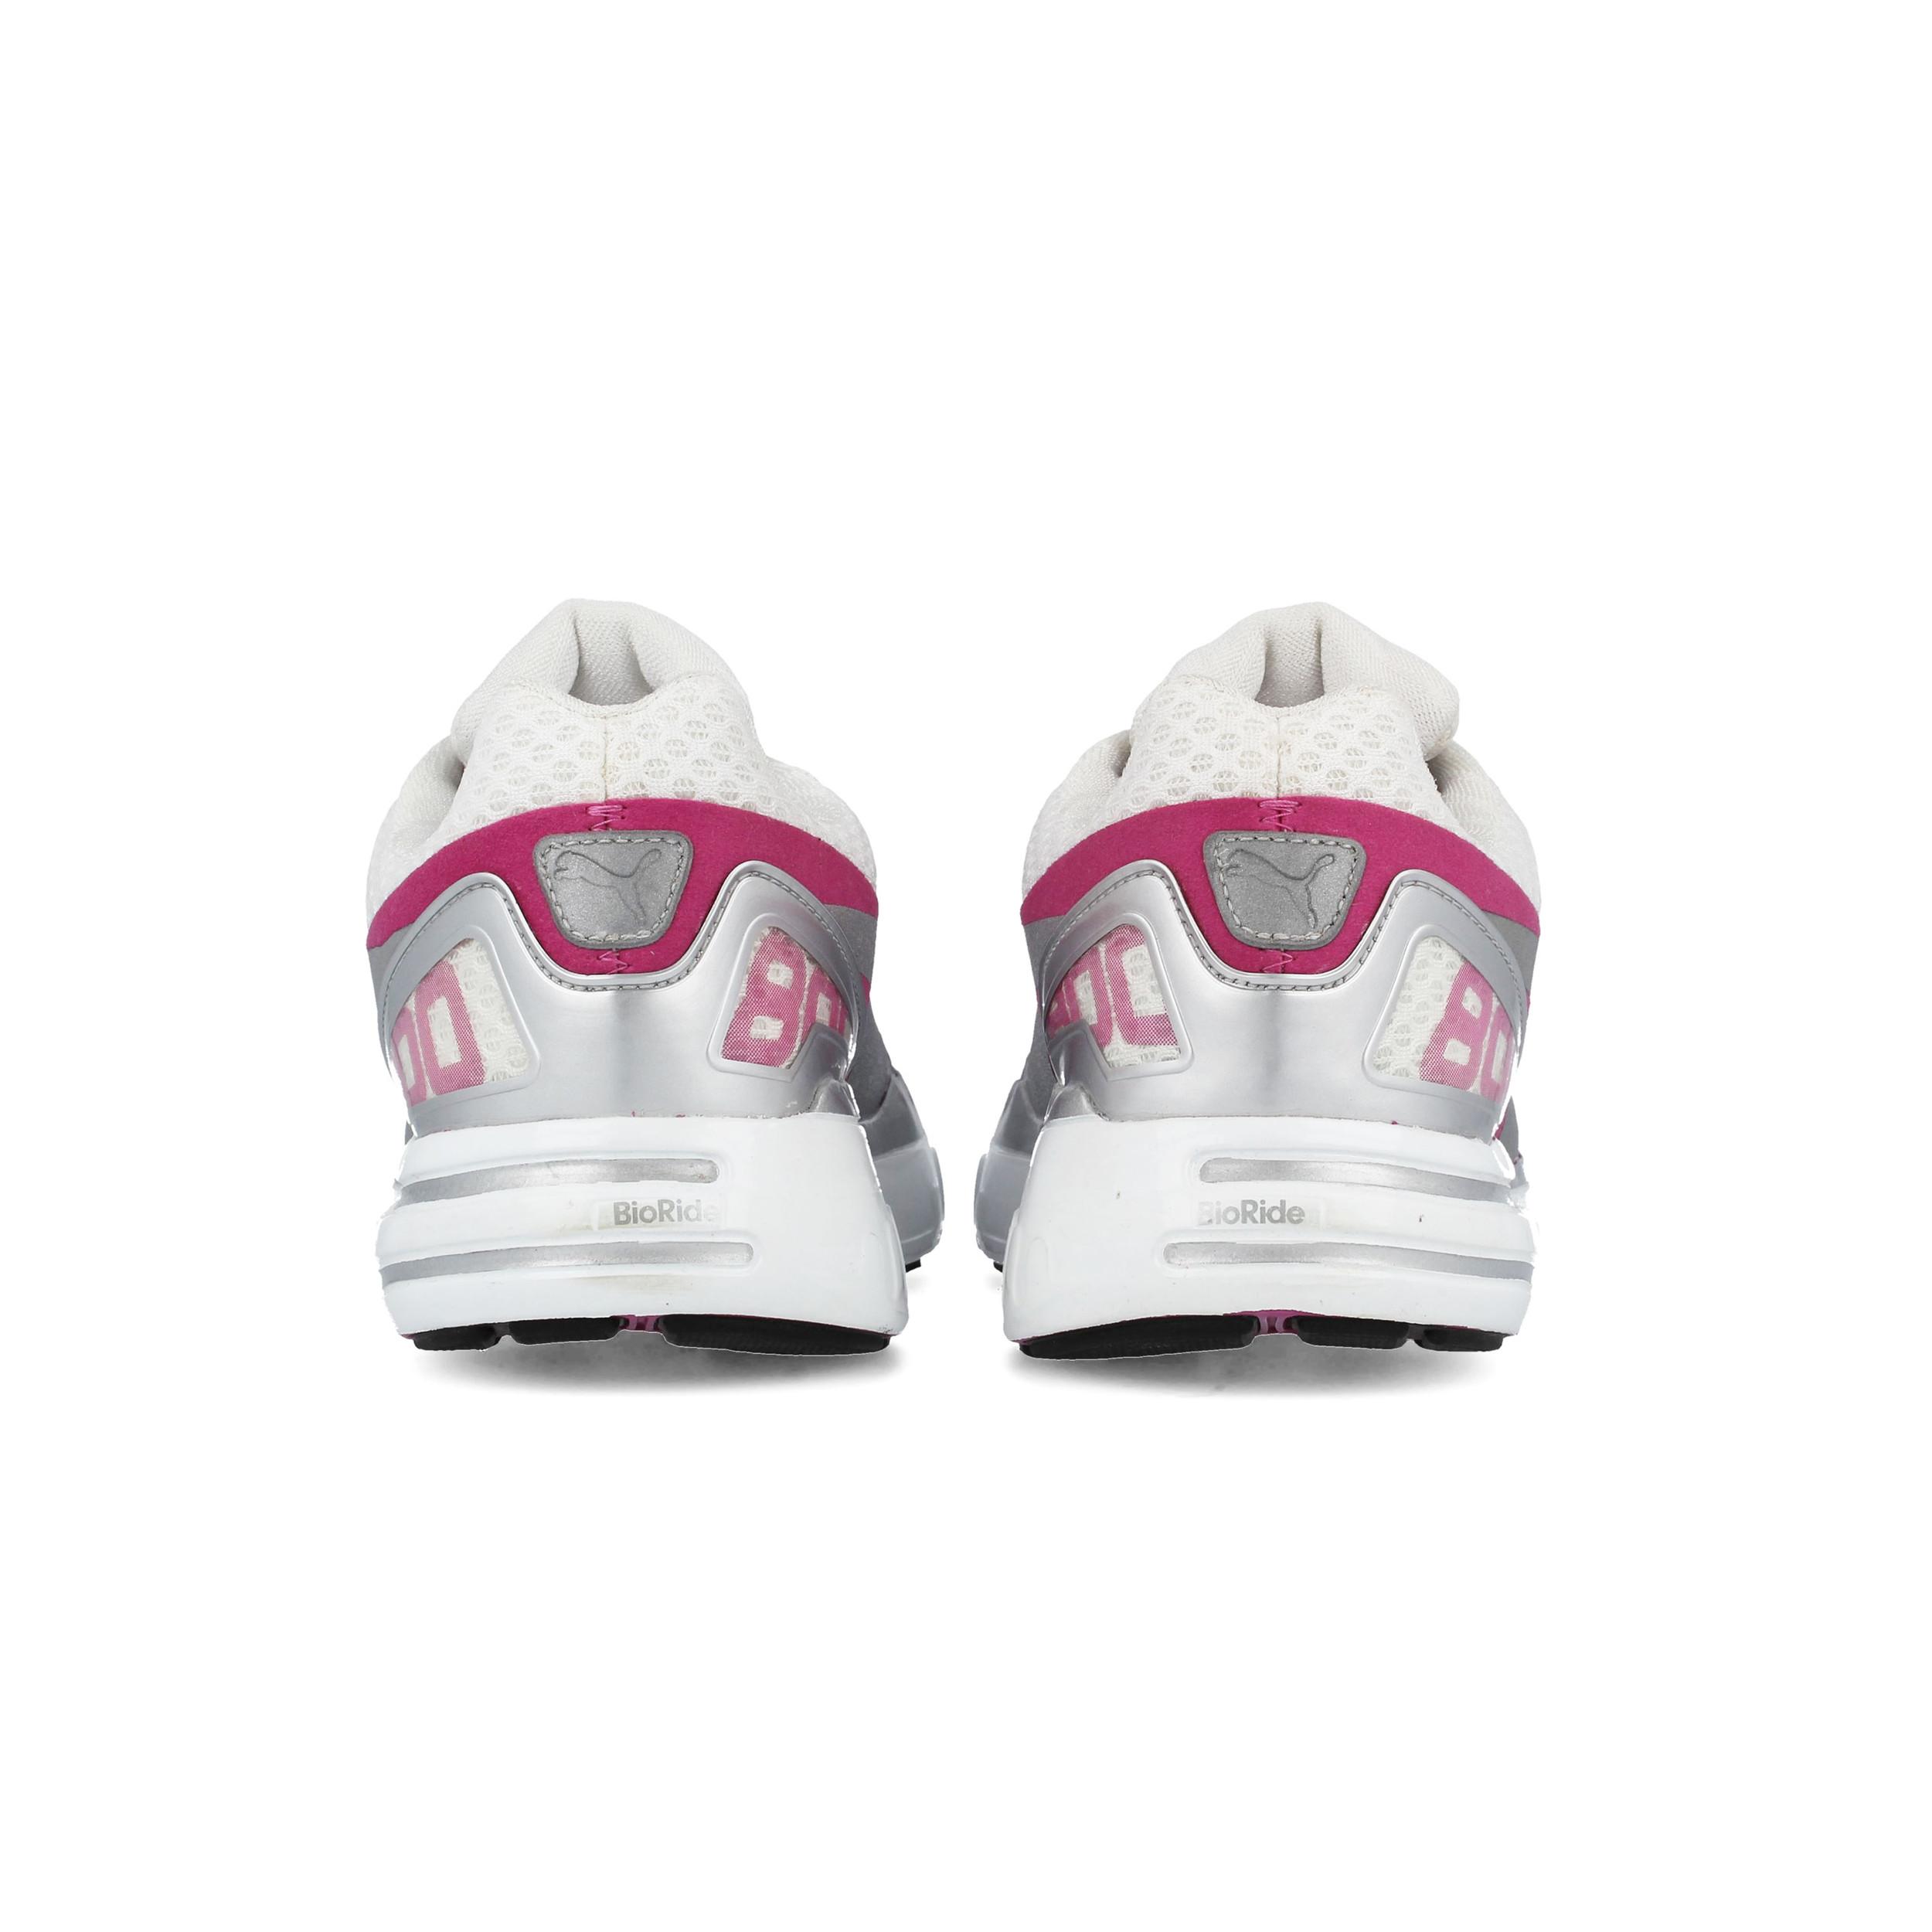 designer fashion 0a2a3 2279a Puma Mujer Faas 800 Correr Zapatos Zapatillas Blanco Deporte Transpirable